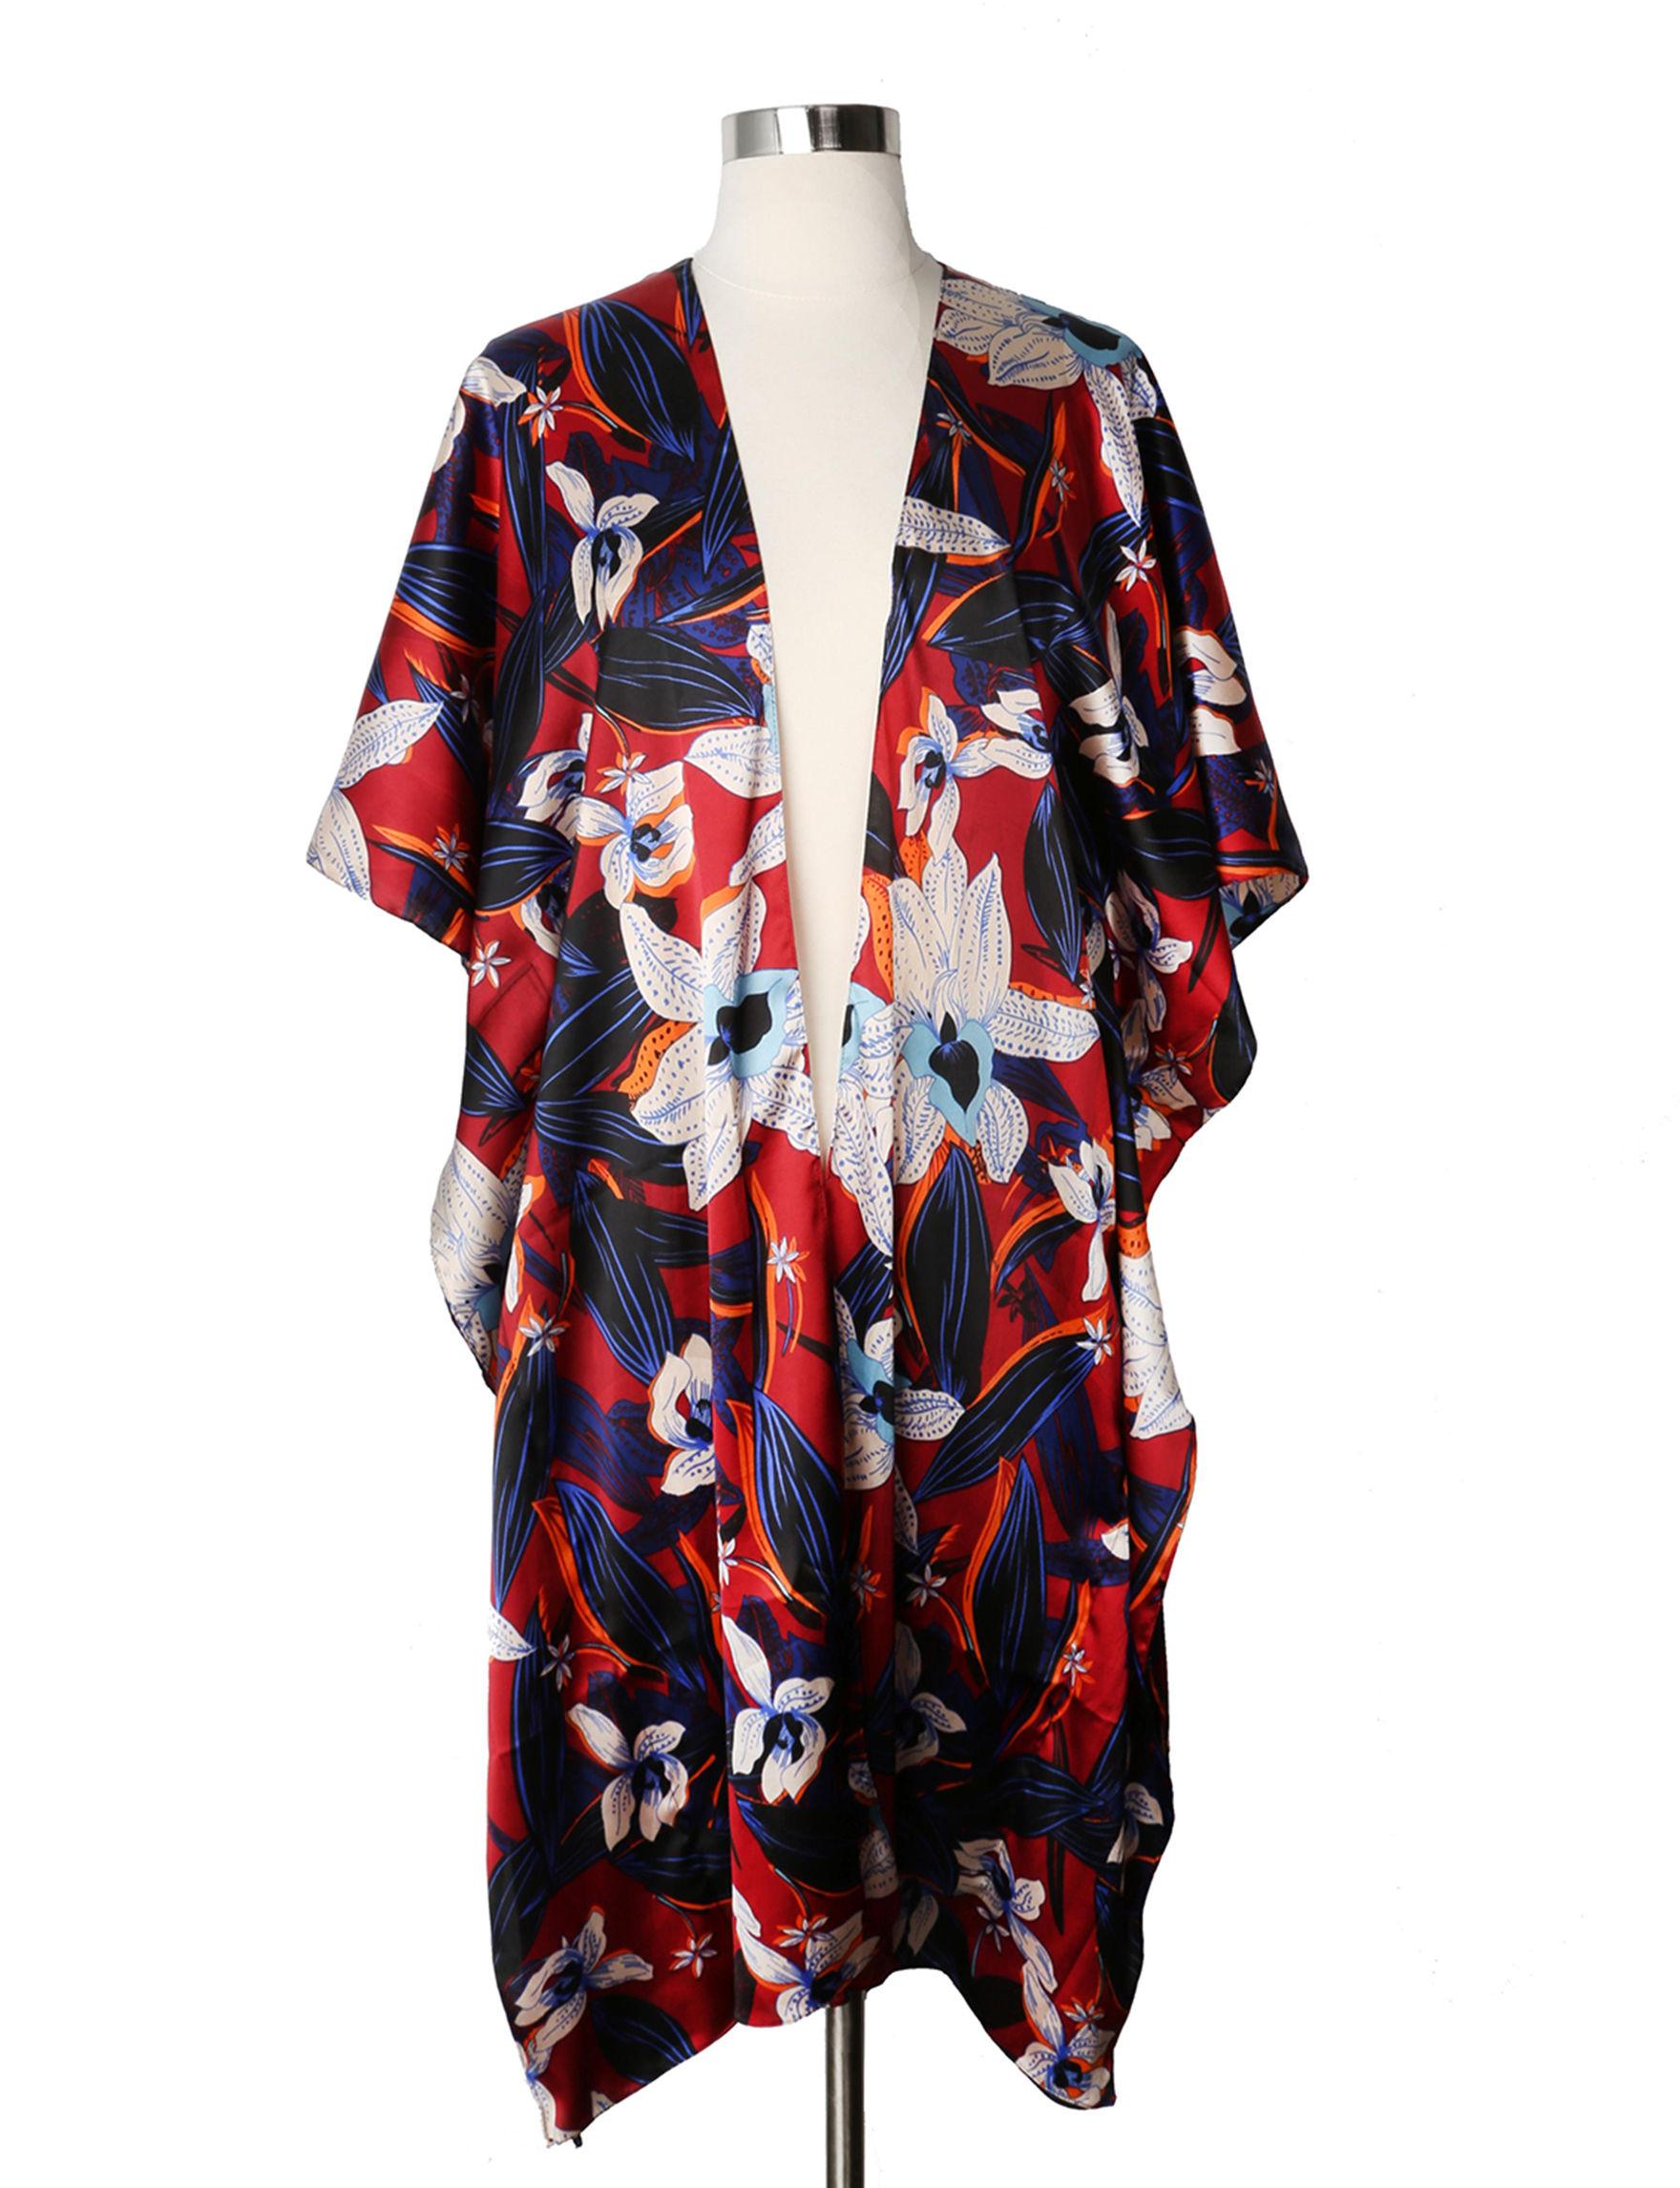 Steve Madden Red Floral Kimonos & Toppers